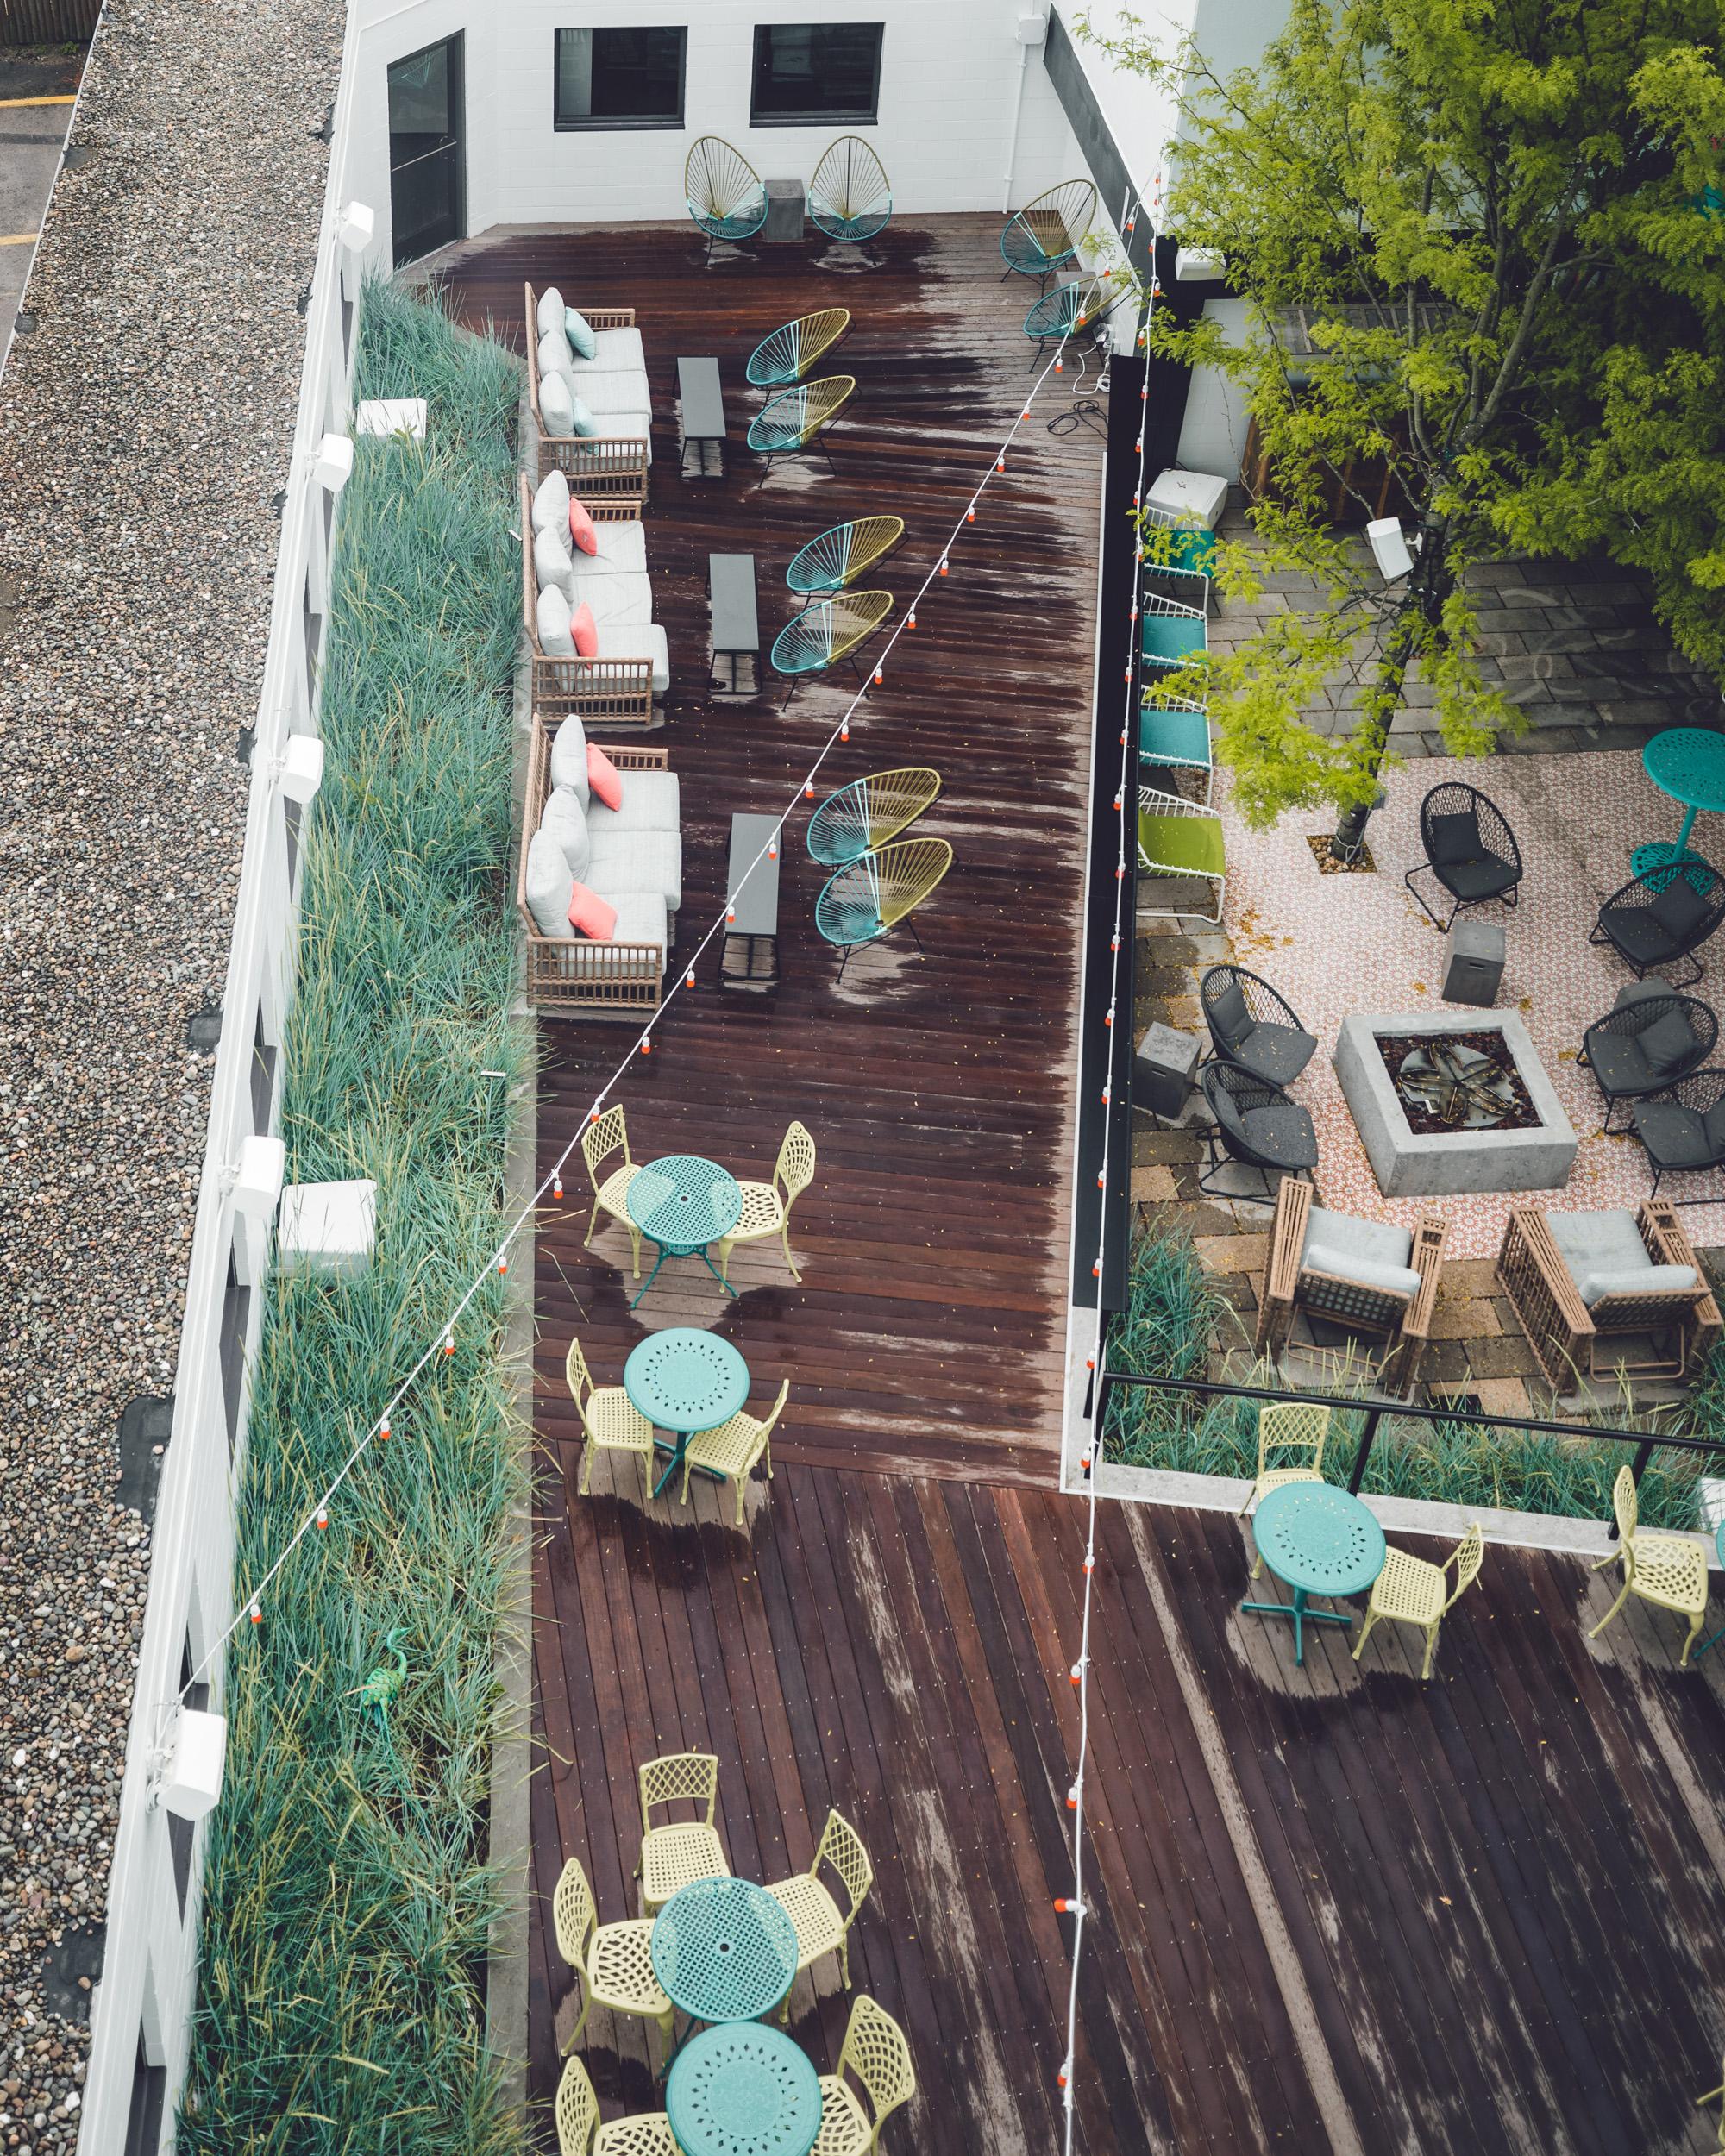 Rachel Off Duty: Where to Stay in Boston – The Hotel Studio Allston